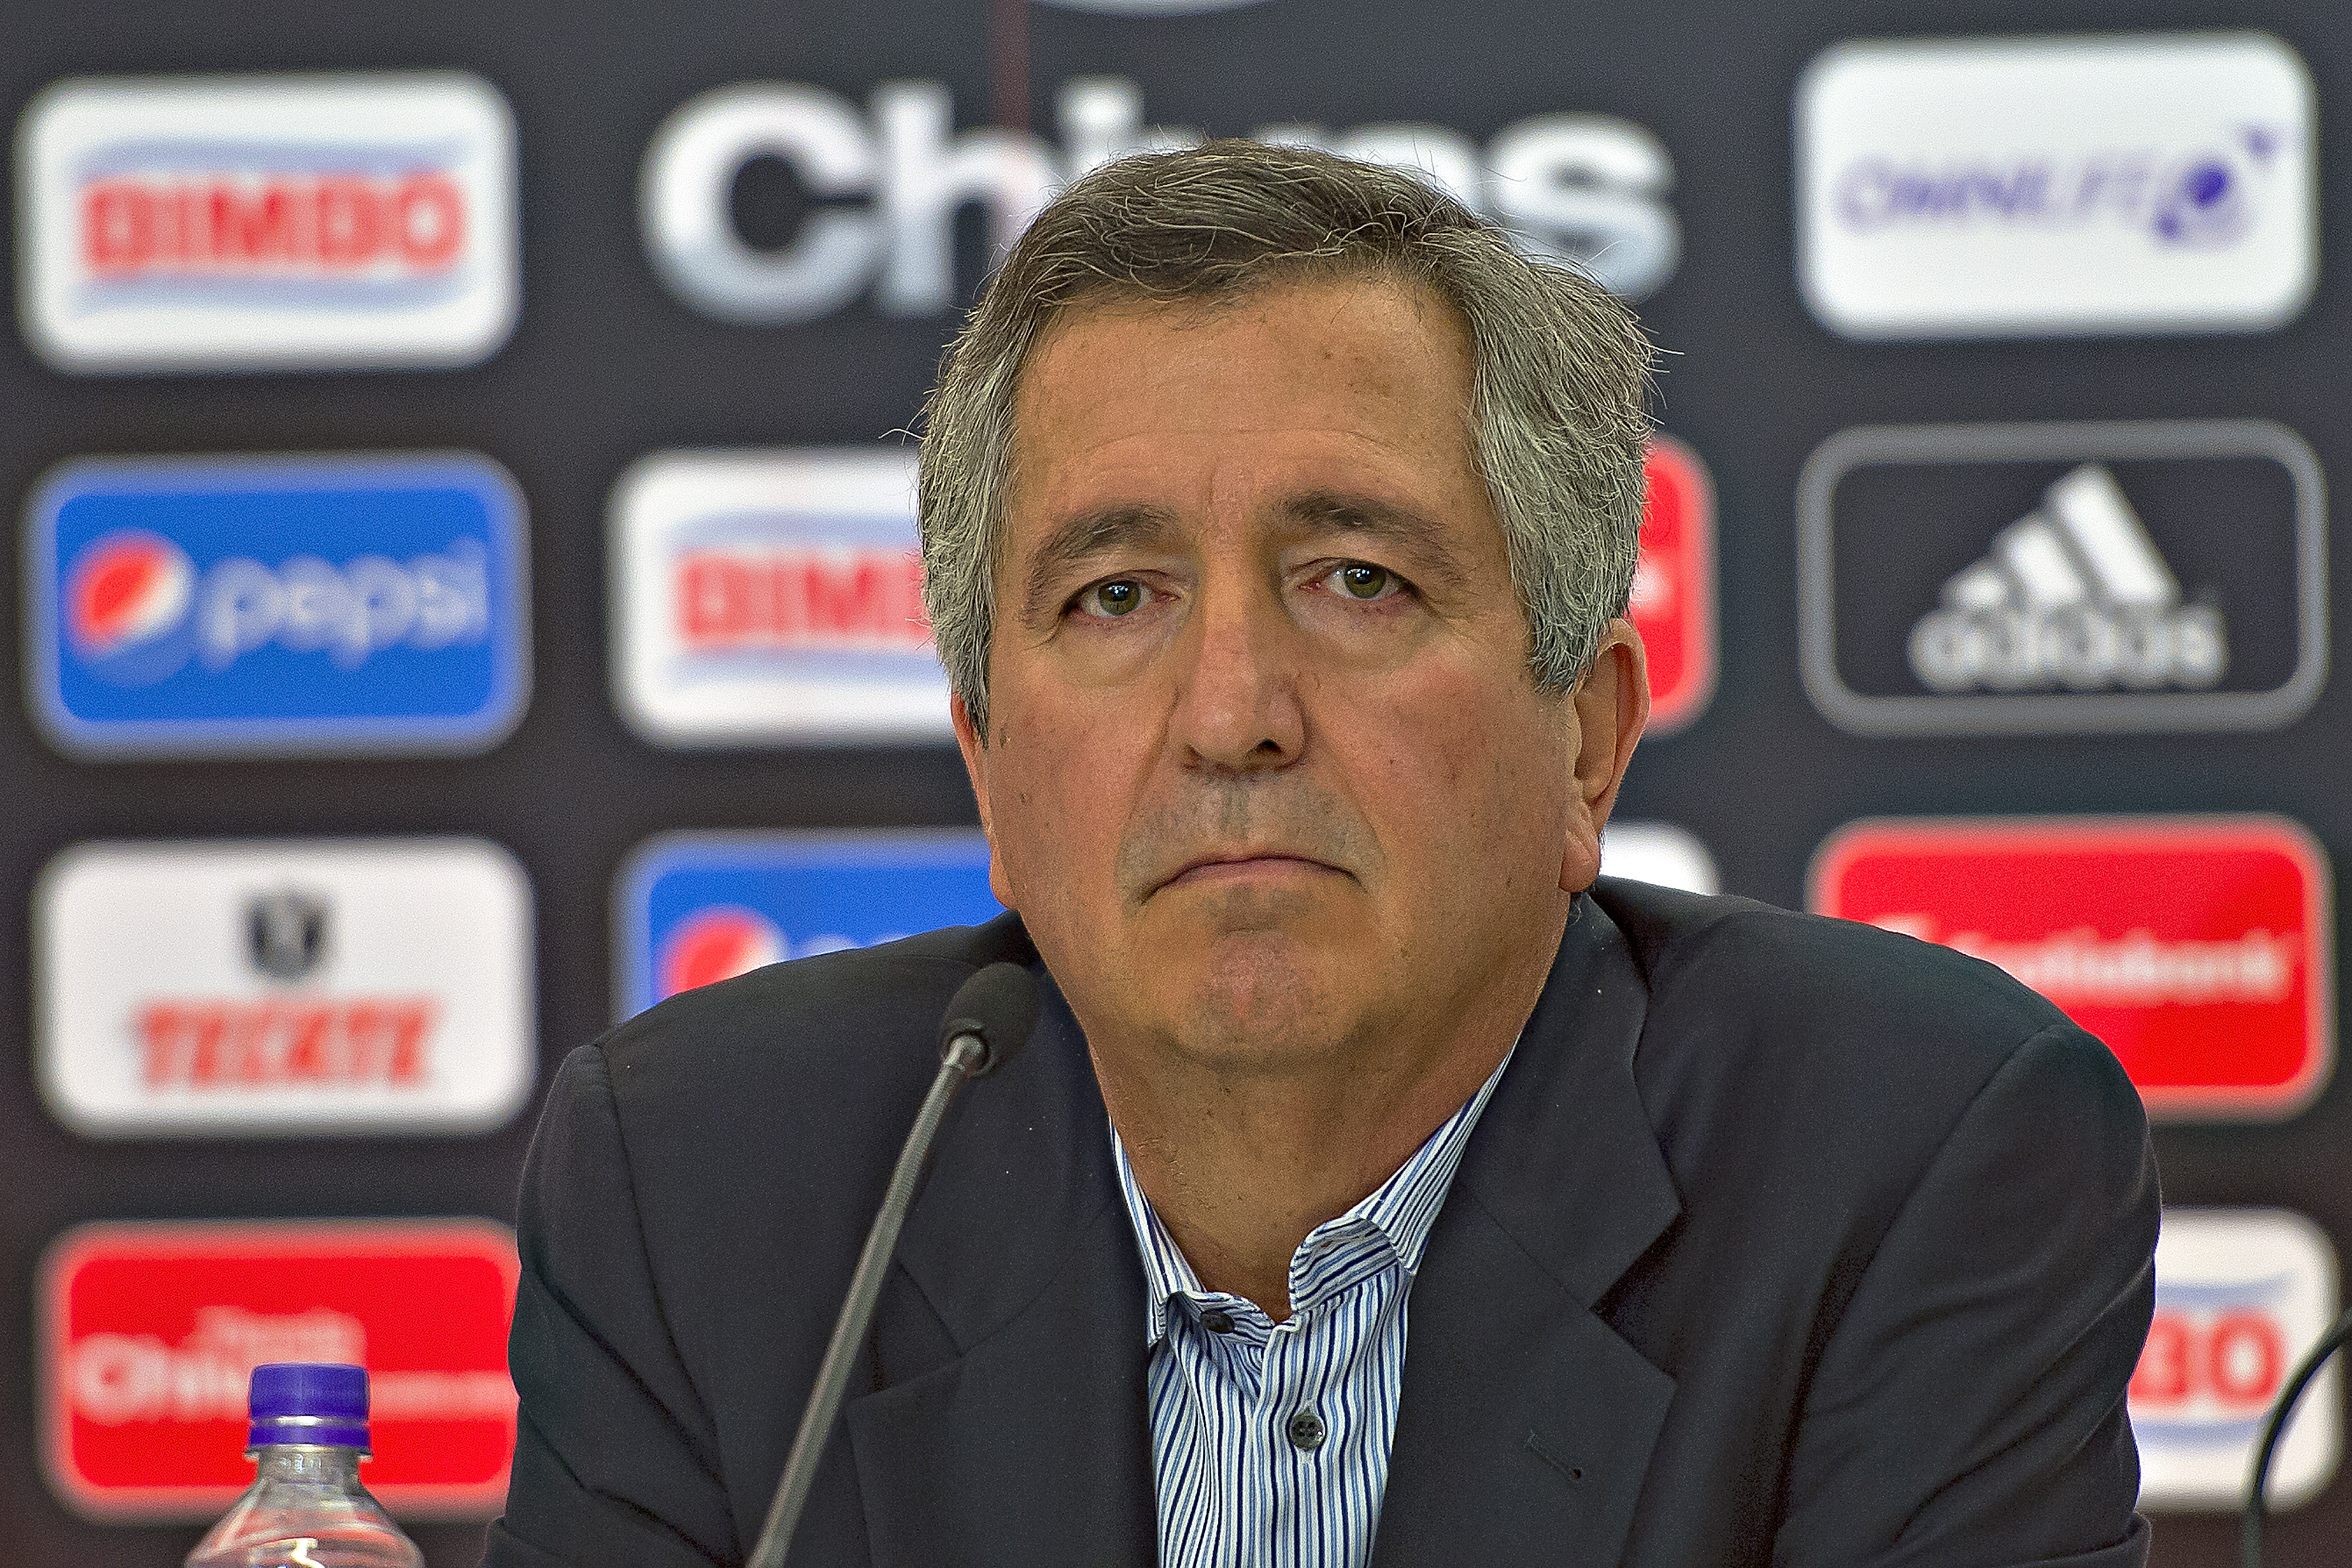 Jorge Vergara Hipoteca Chivas Patrimonio Estadio Guadalajara Problemas